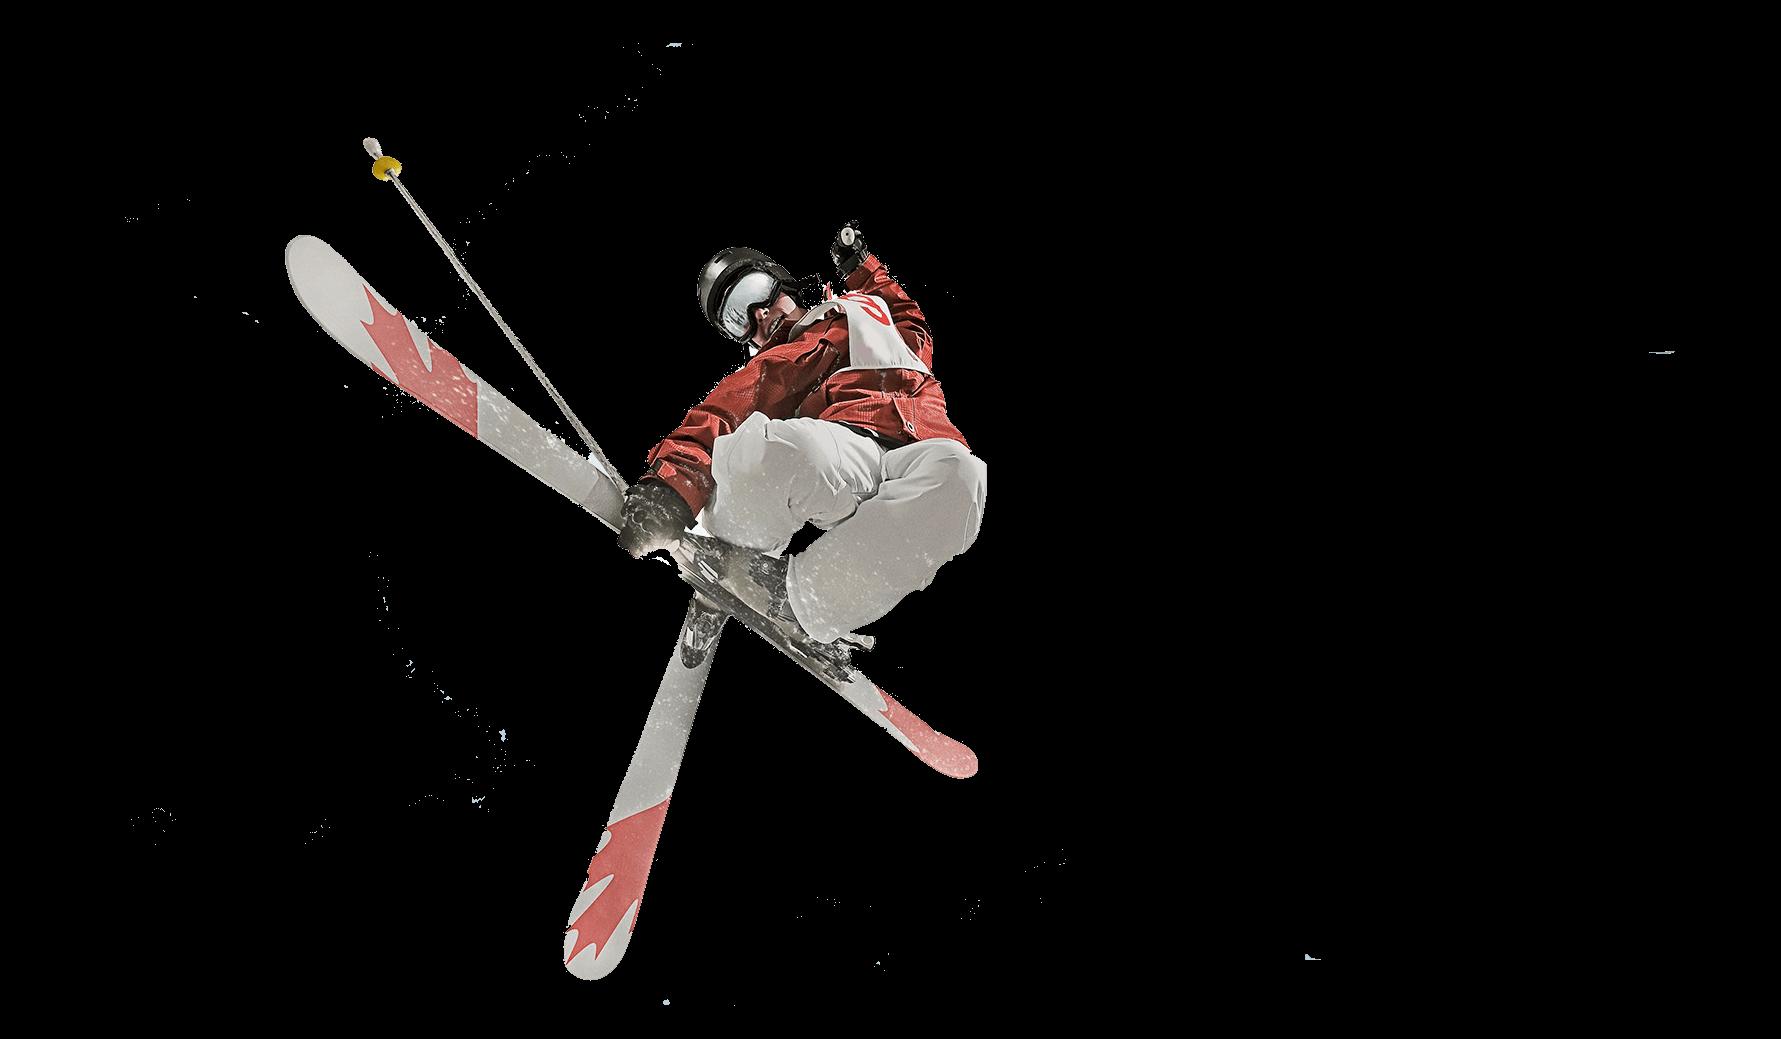 Aviemore School Of Snowsports